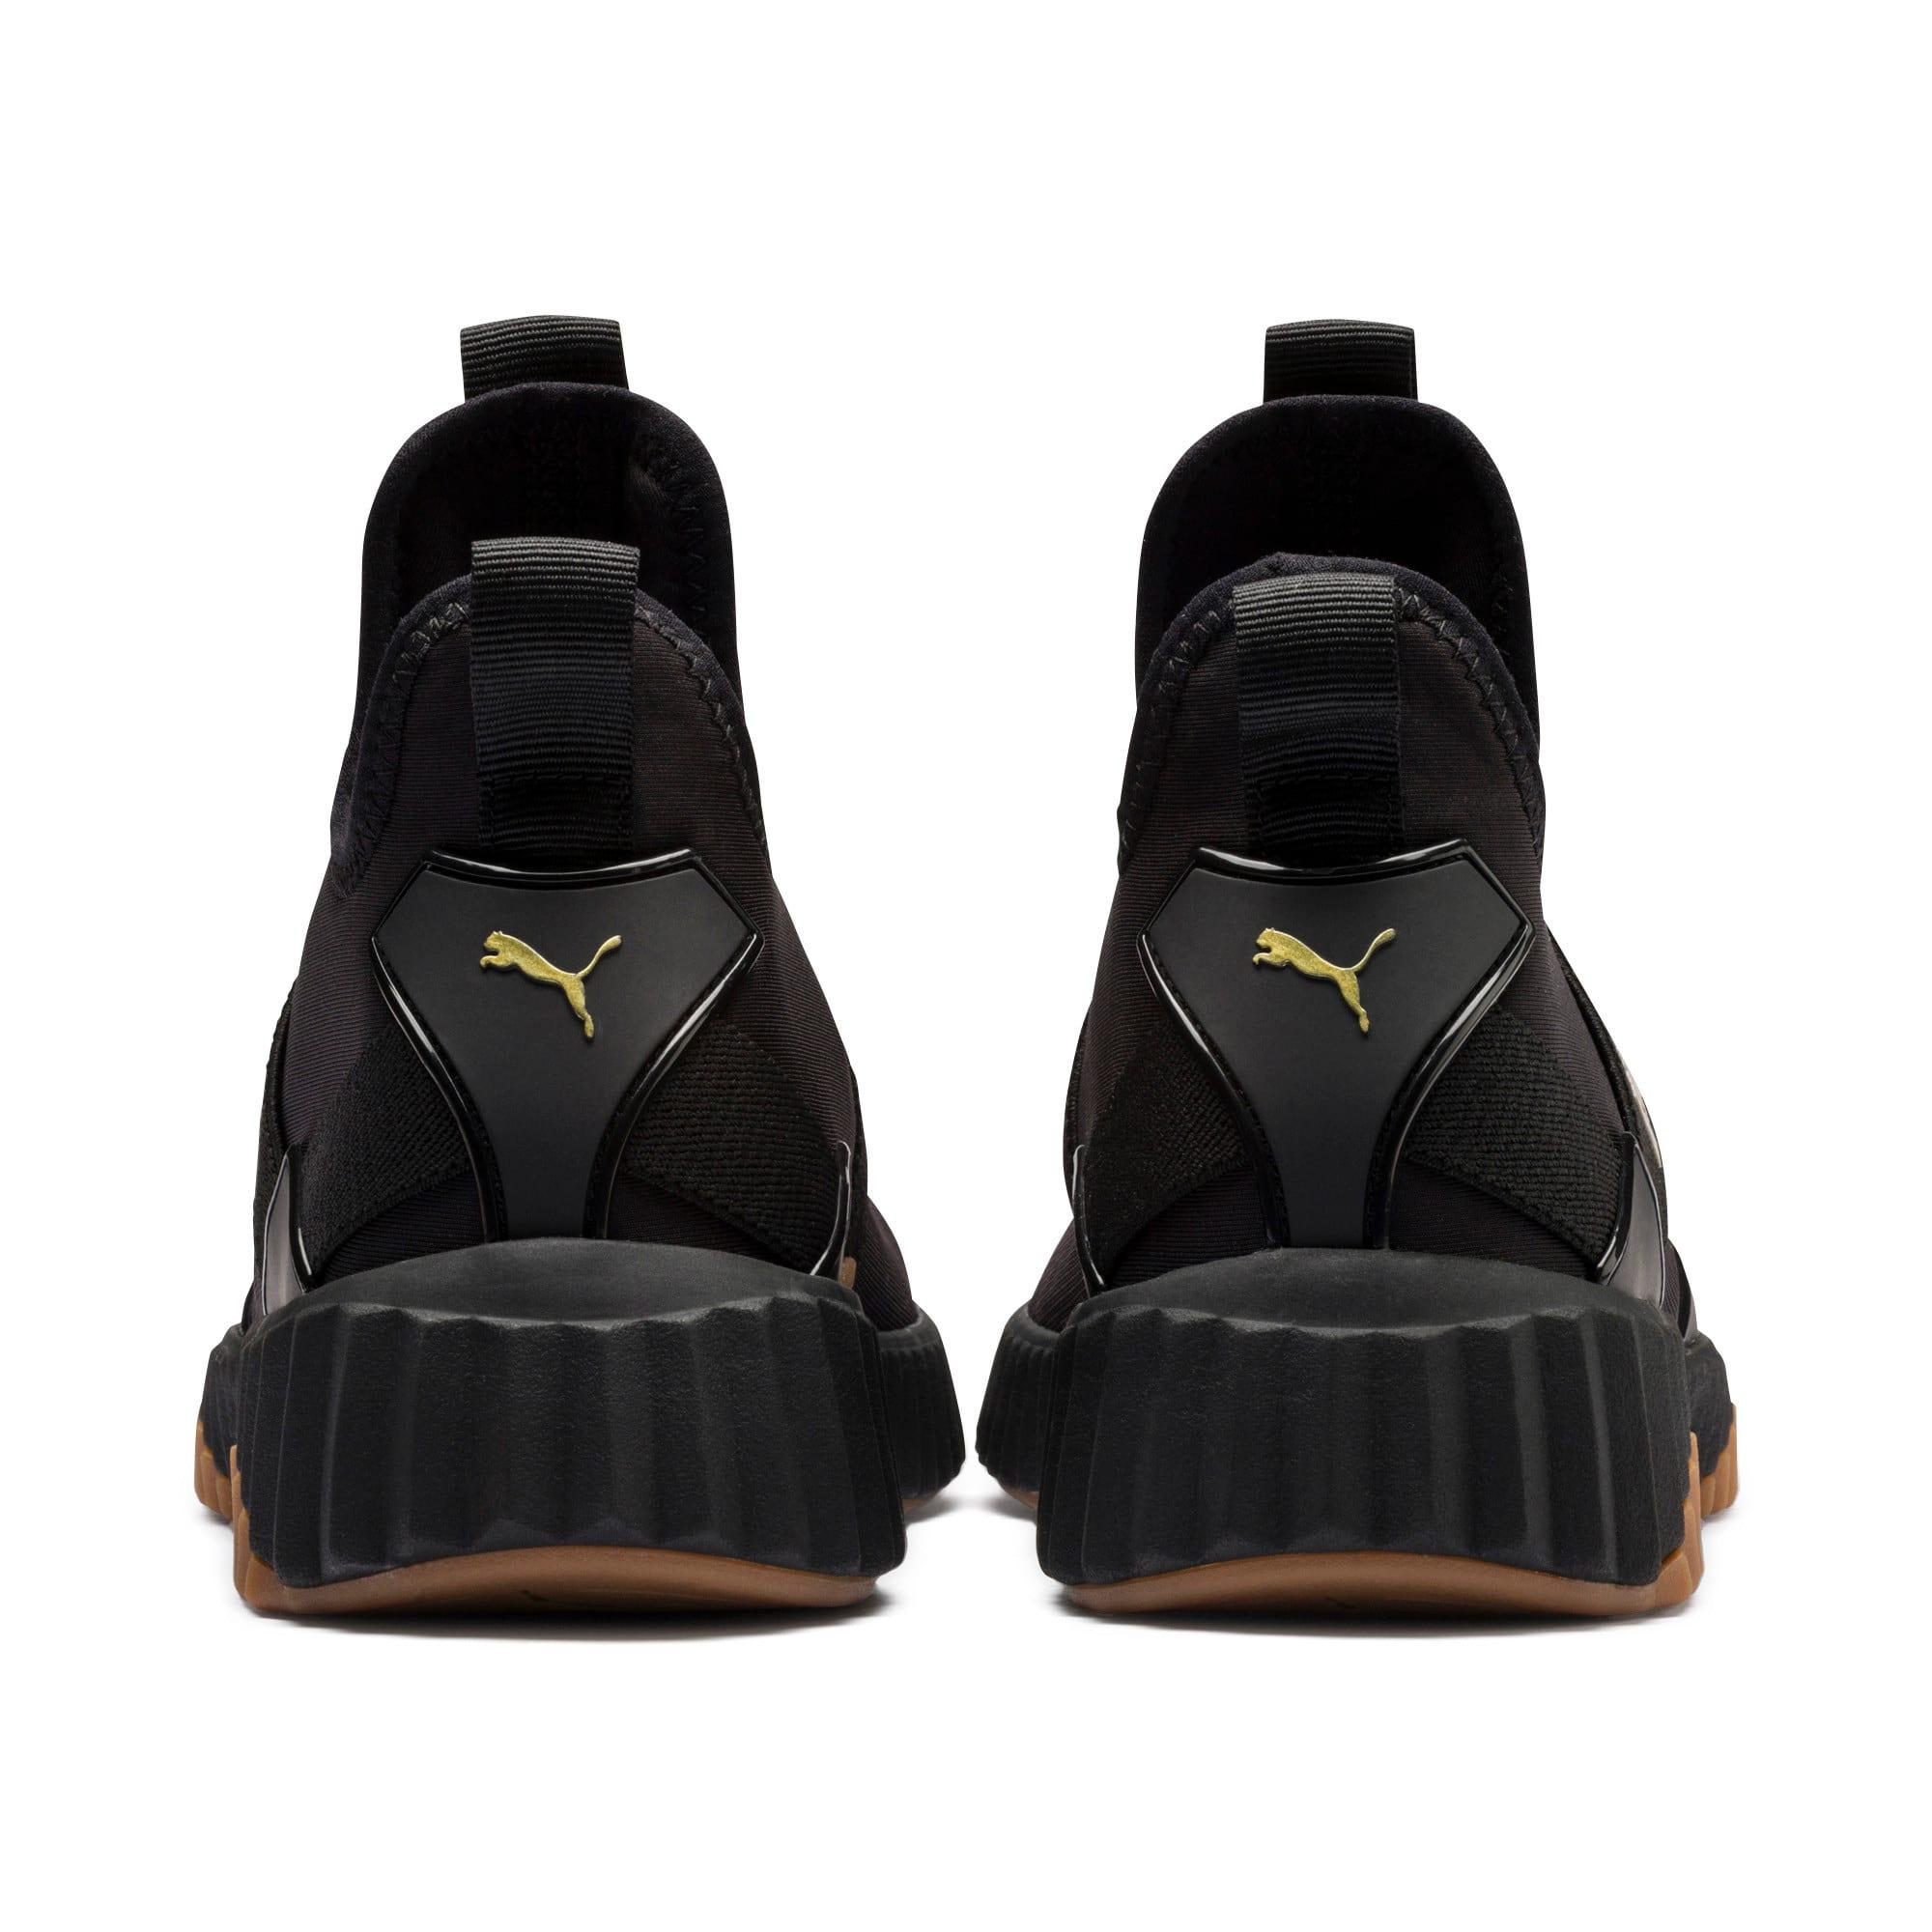 Thumbnail 4 of Defy Mid Sparkle Women's Training Shoes, Puma Black-Metallic Gold, medium